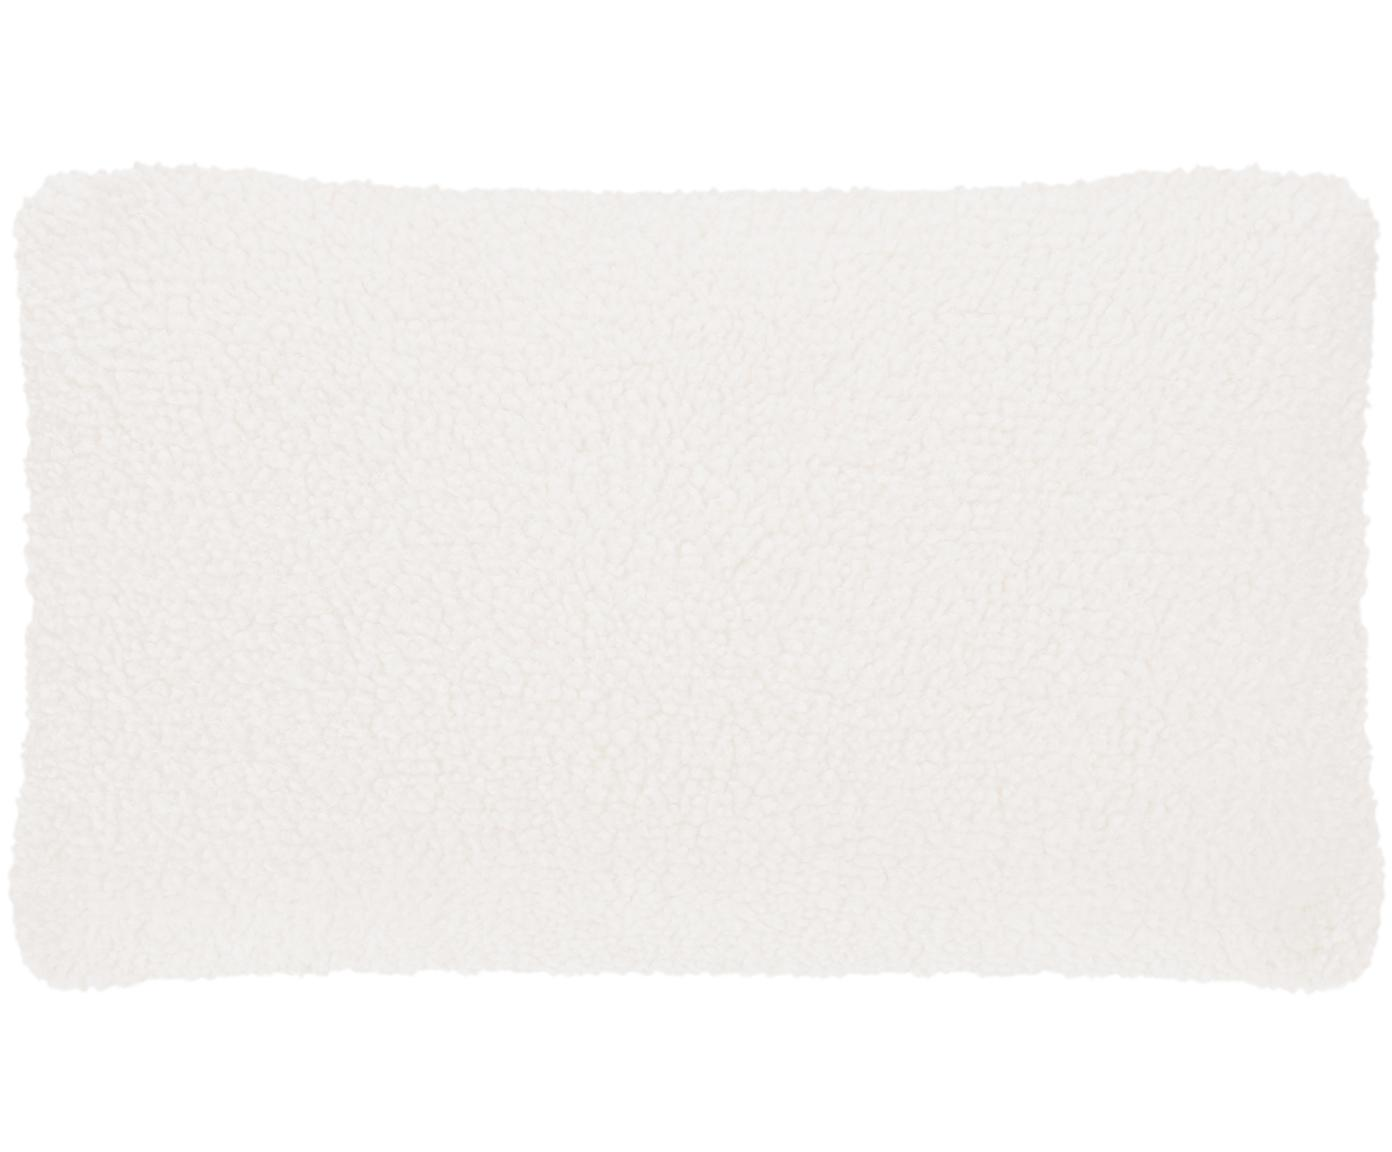 Funda de cojín de borreguillo Mille, Funda: poliéster (borreguillo), Crema, An 30 x L 50 cm